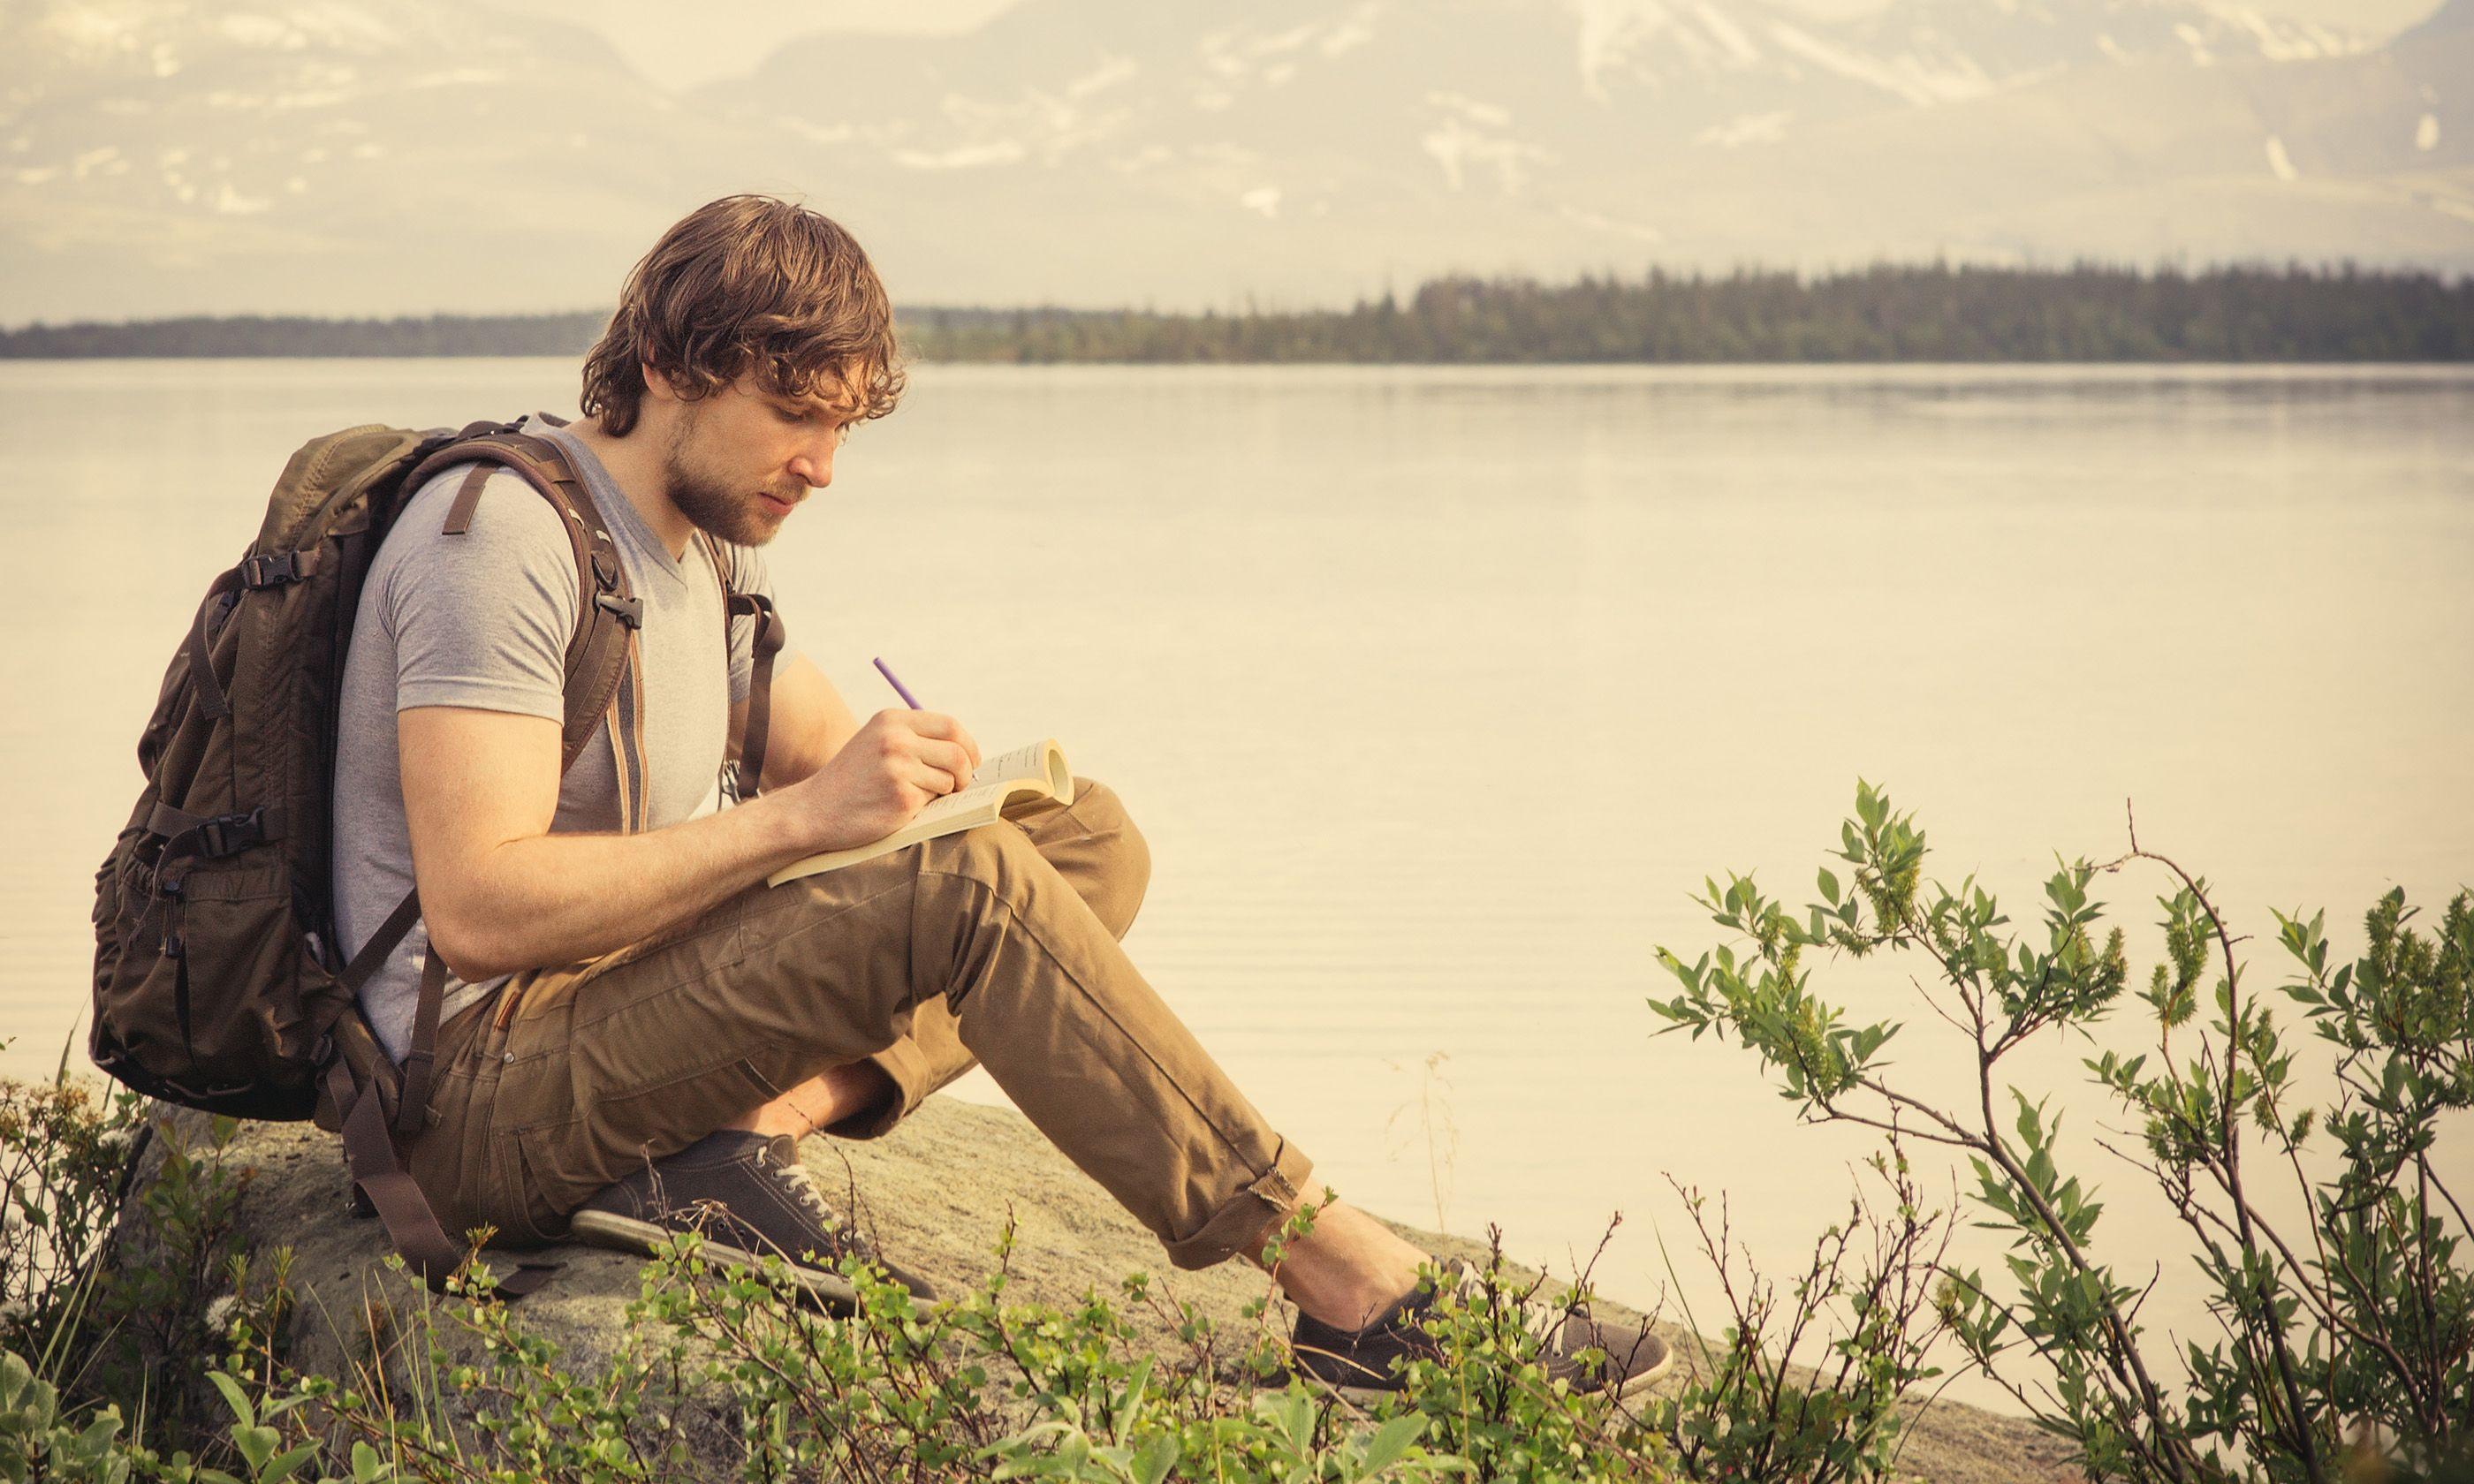 Backpacker writing in journal (Shutterstock.com)